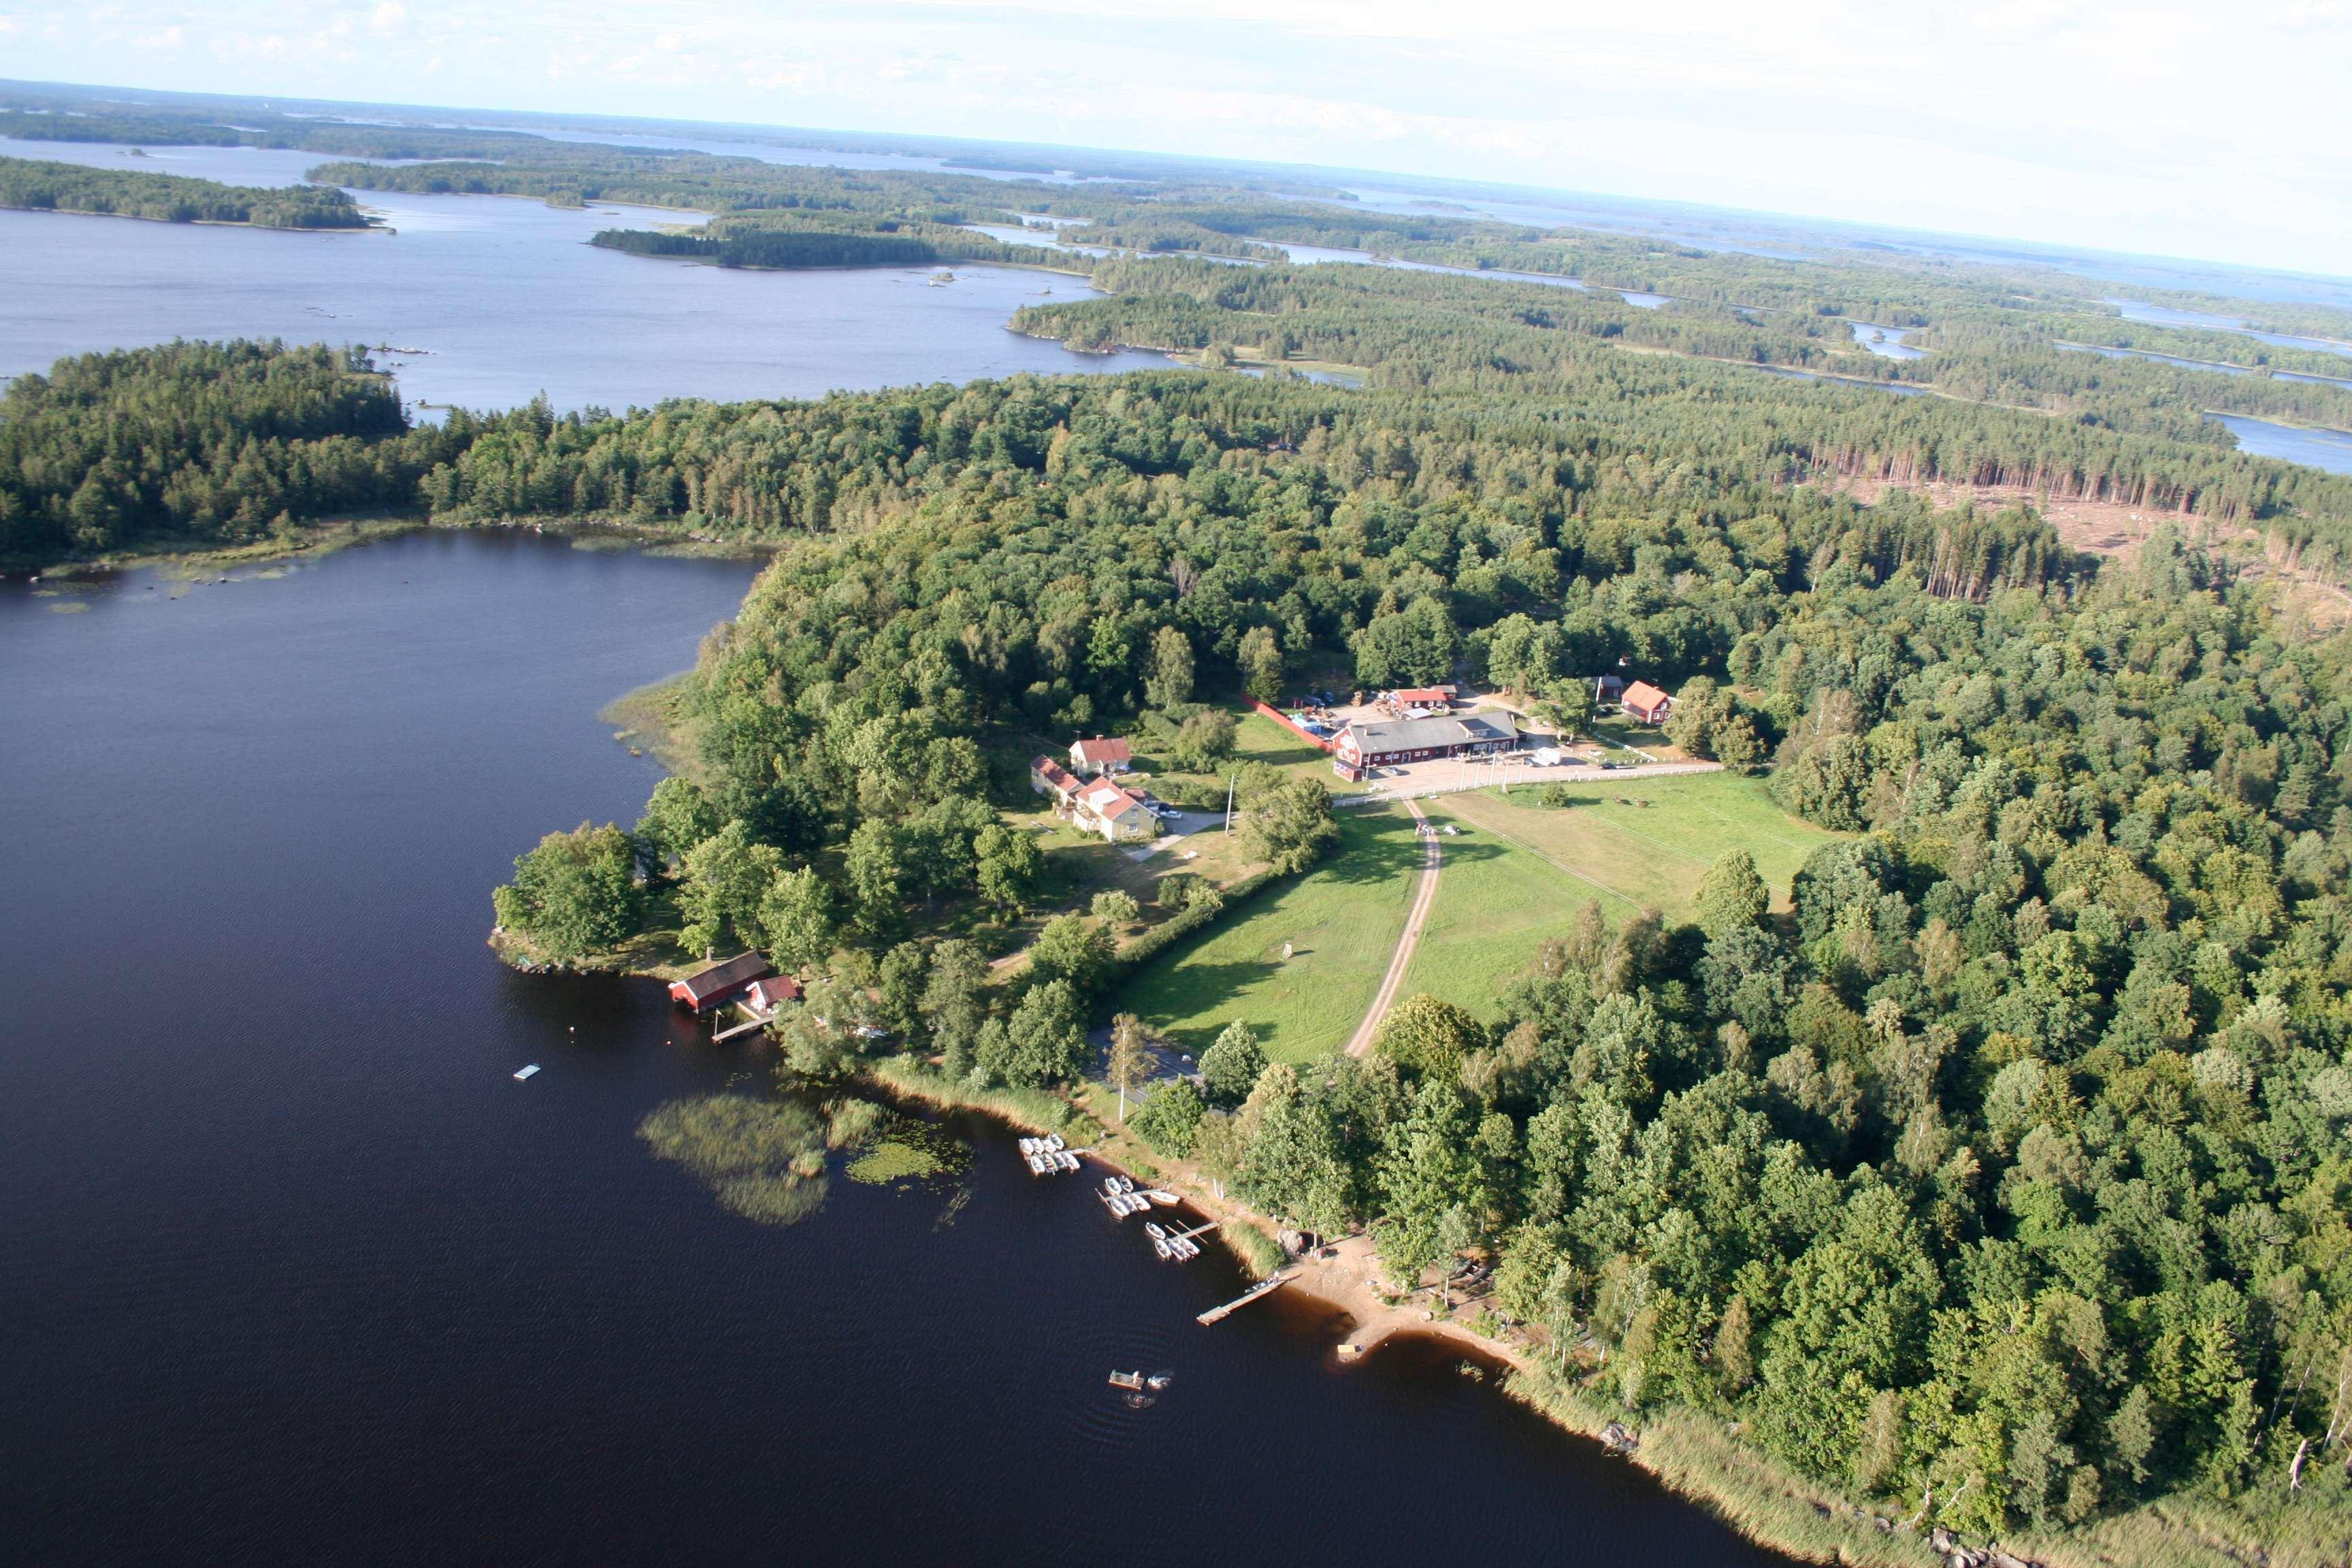 Getnö Gård - Lake Åsnen Resort Aktivitätszentrum